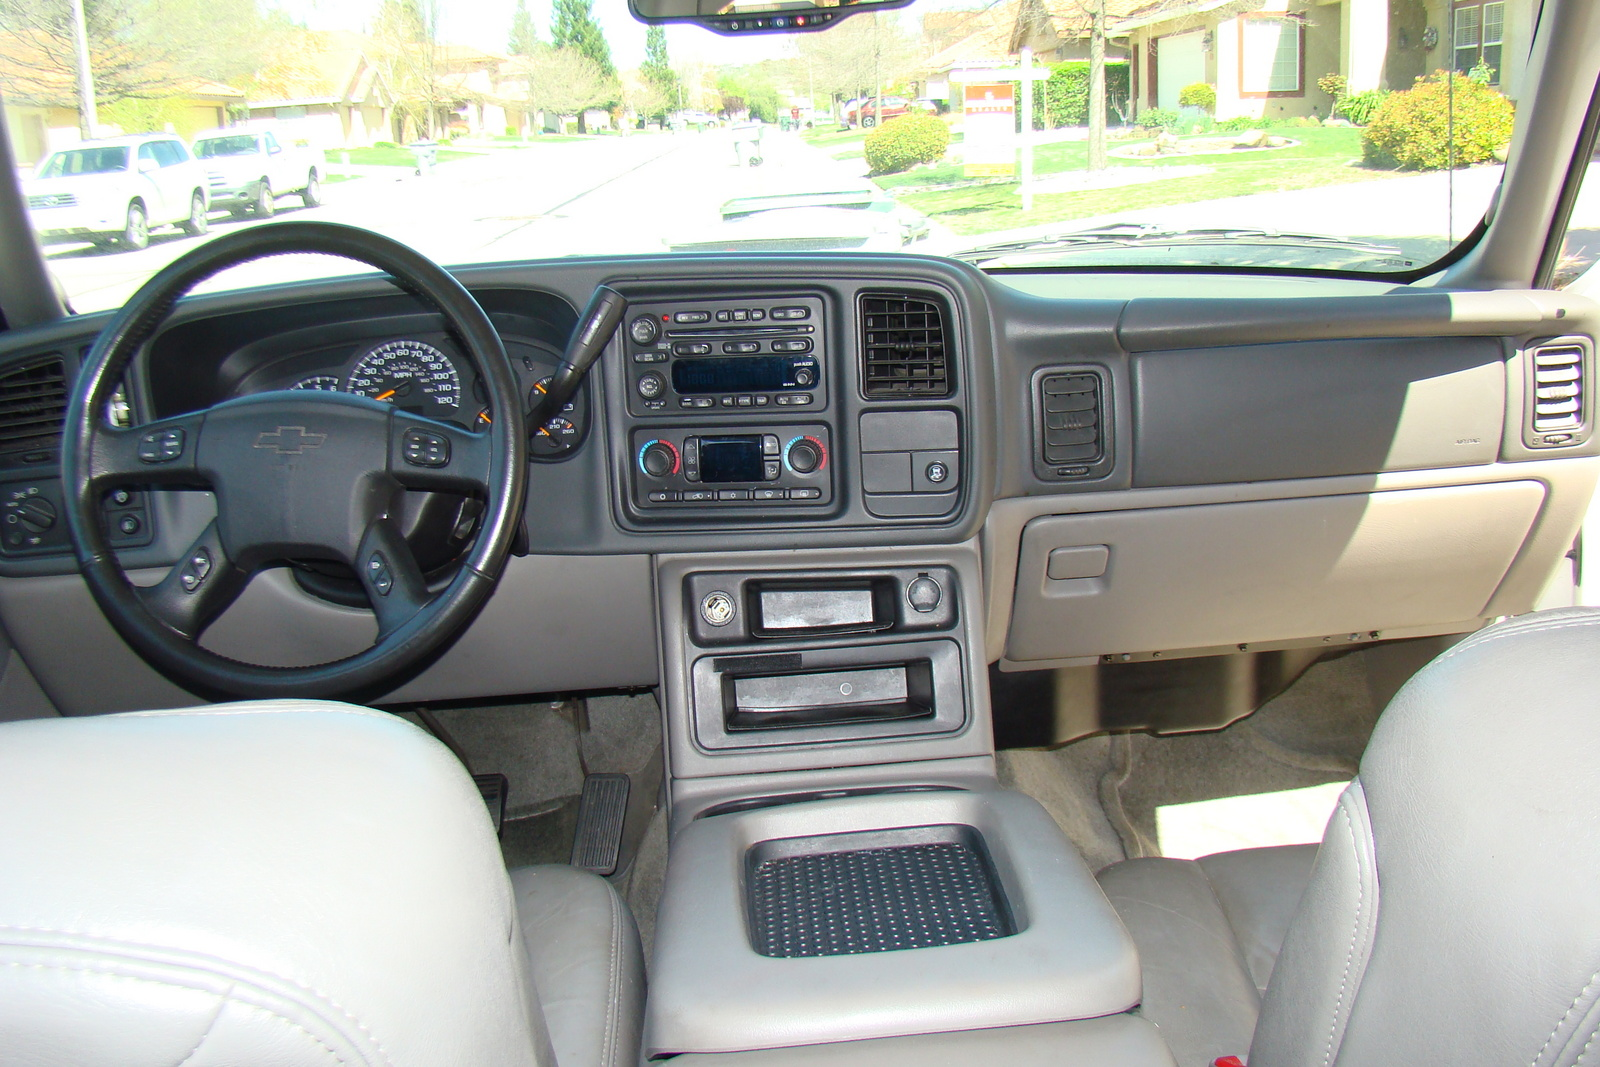 04 Cadillac Escalade Radio Wiring Diagram Wire Data Schema Ats Fuse Box Location 2007 Free 2004